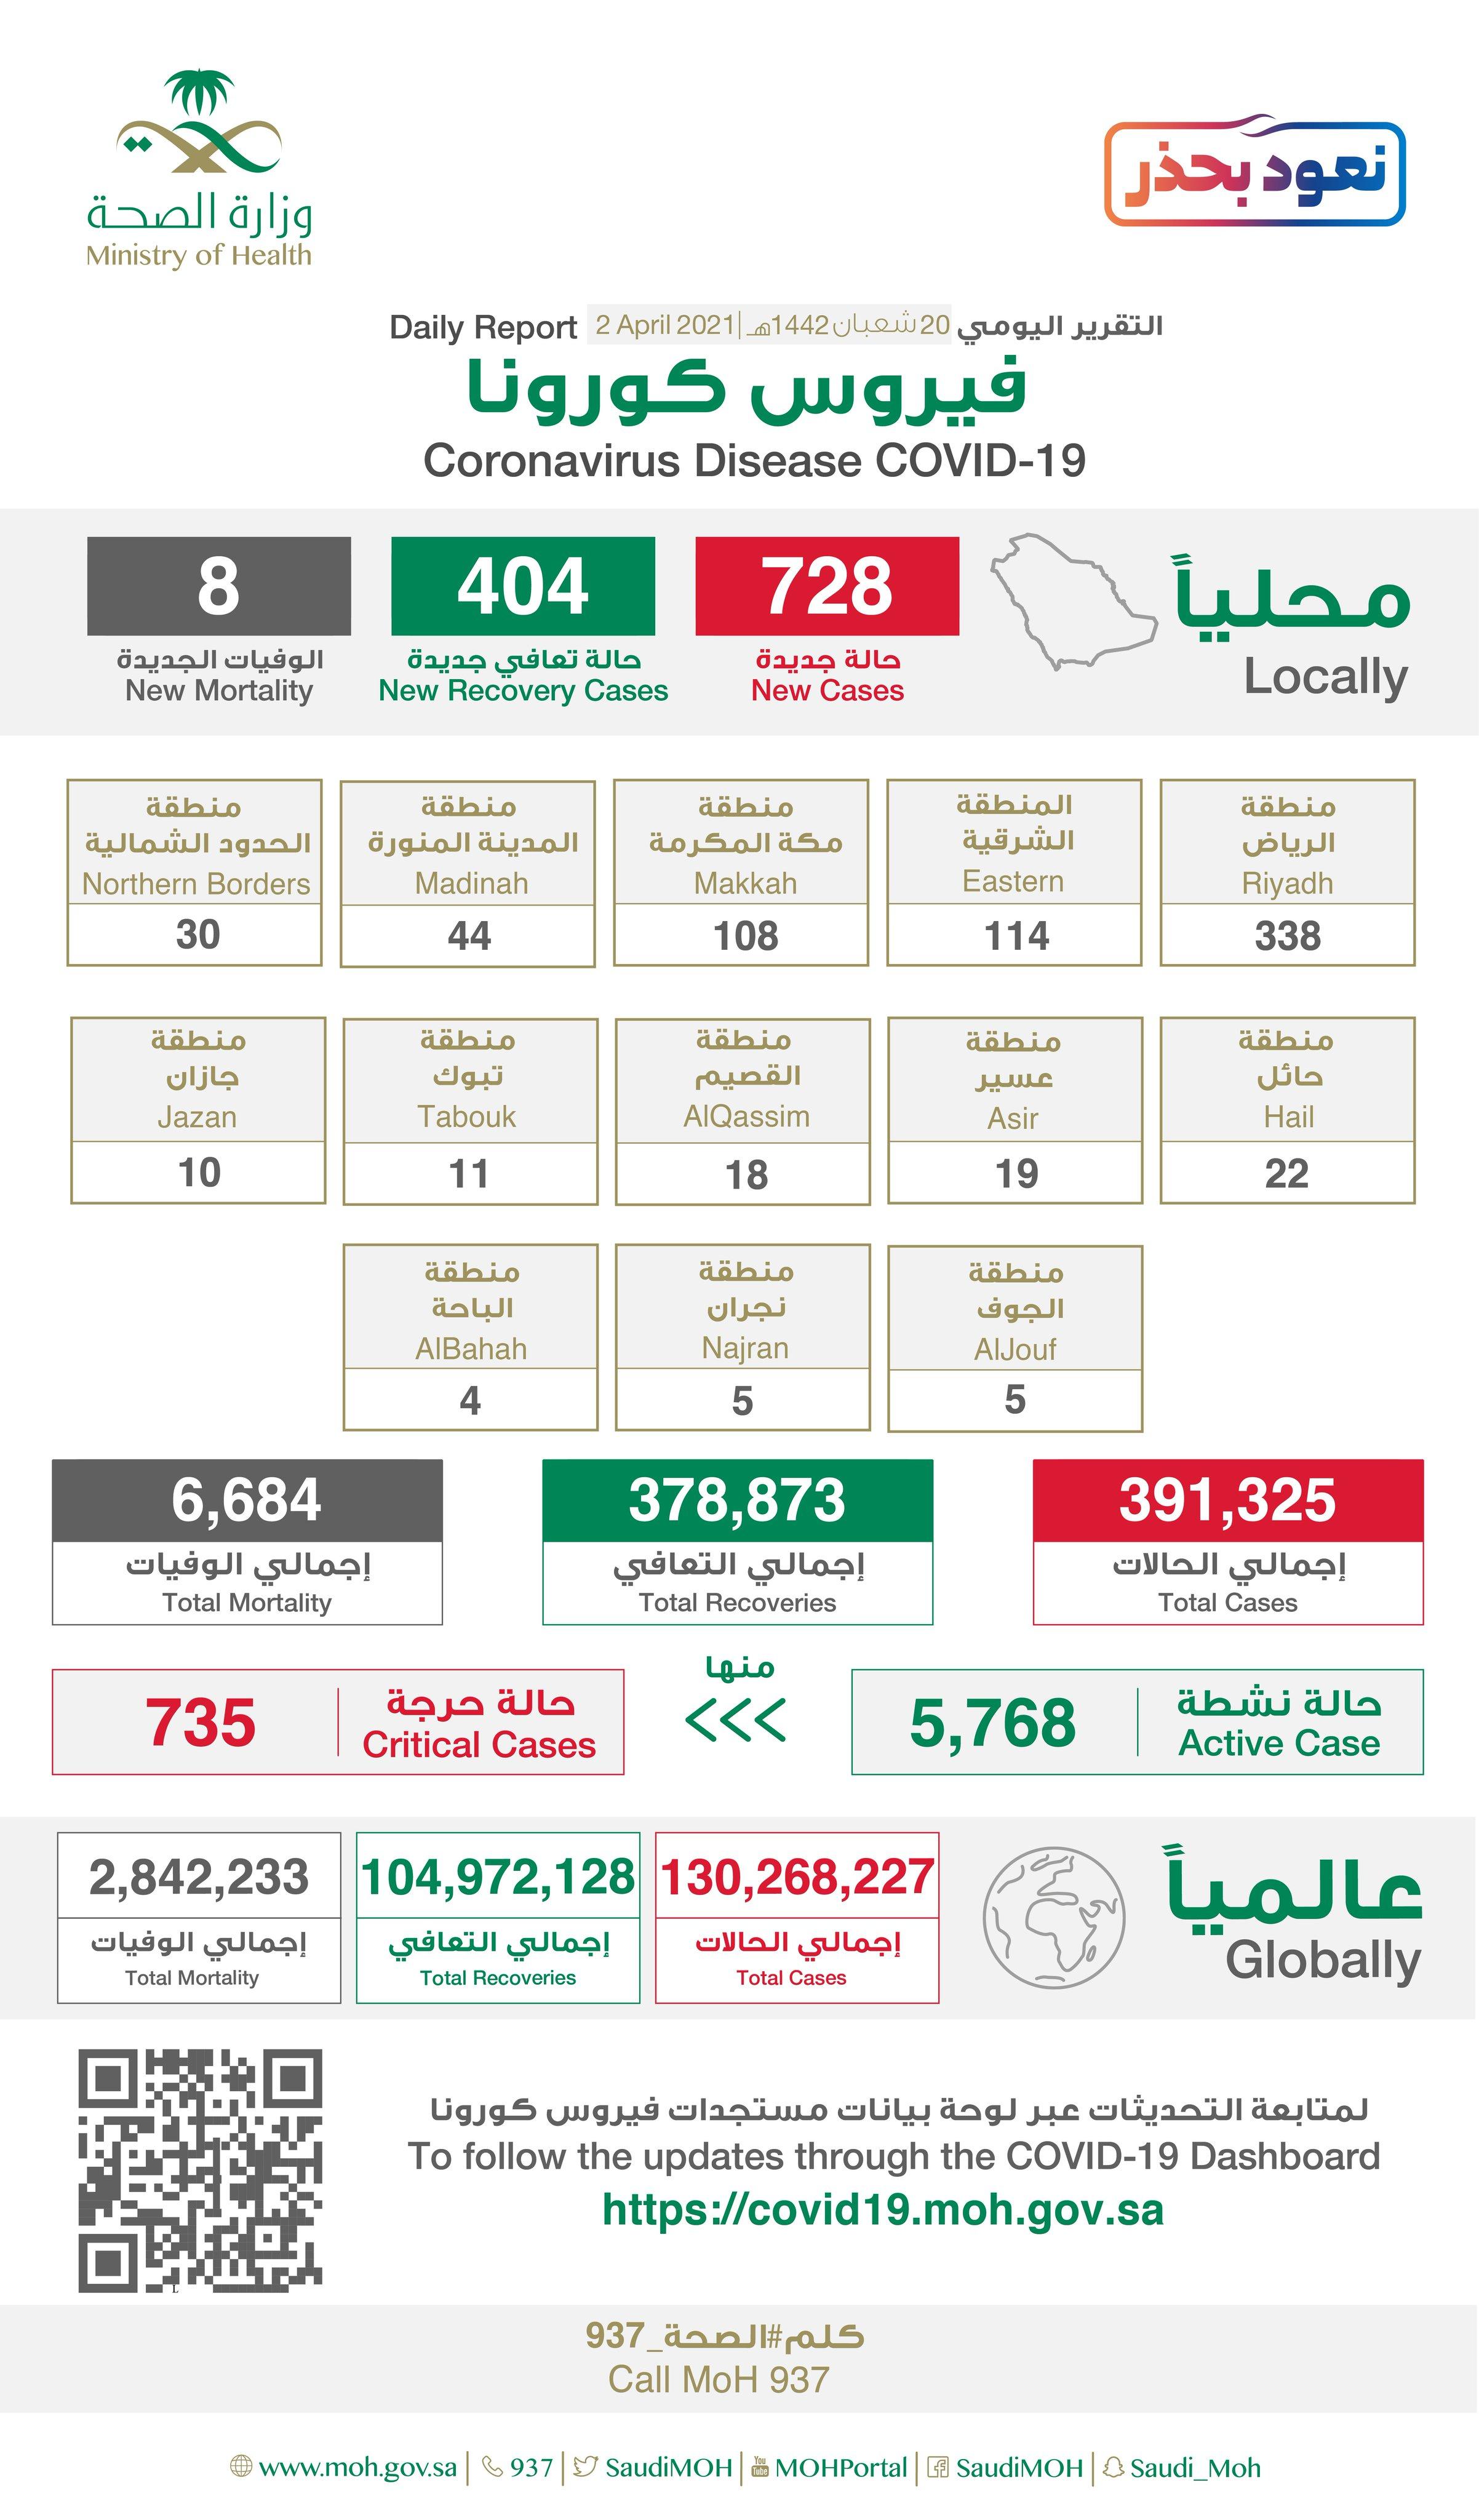 Saudi Arabia Coronavirus : Total Cases :391,325 , New Cases : 728, Cured : 378,873 , Deaths: 6,684, Active Cases : 5,768